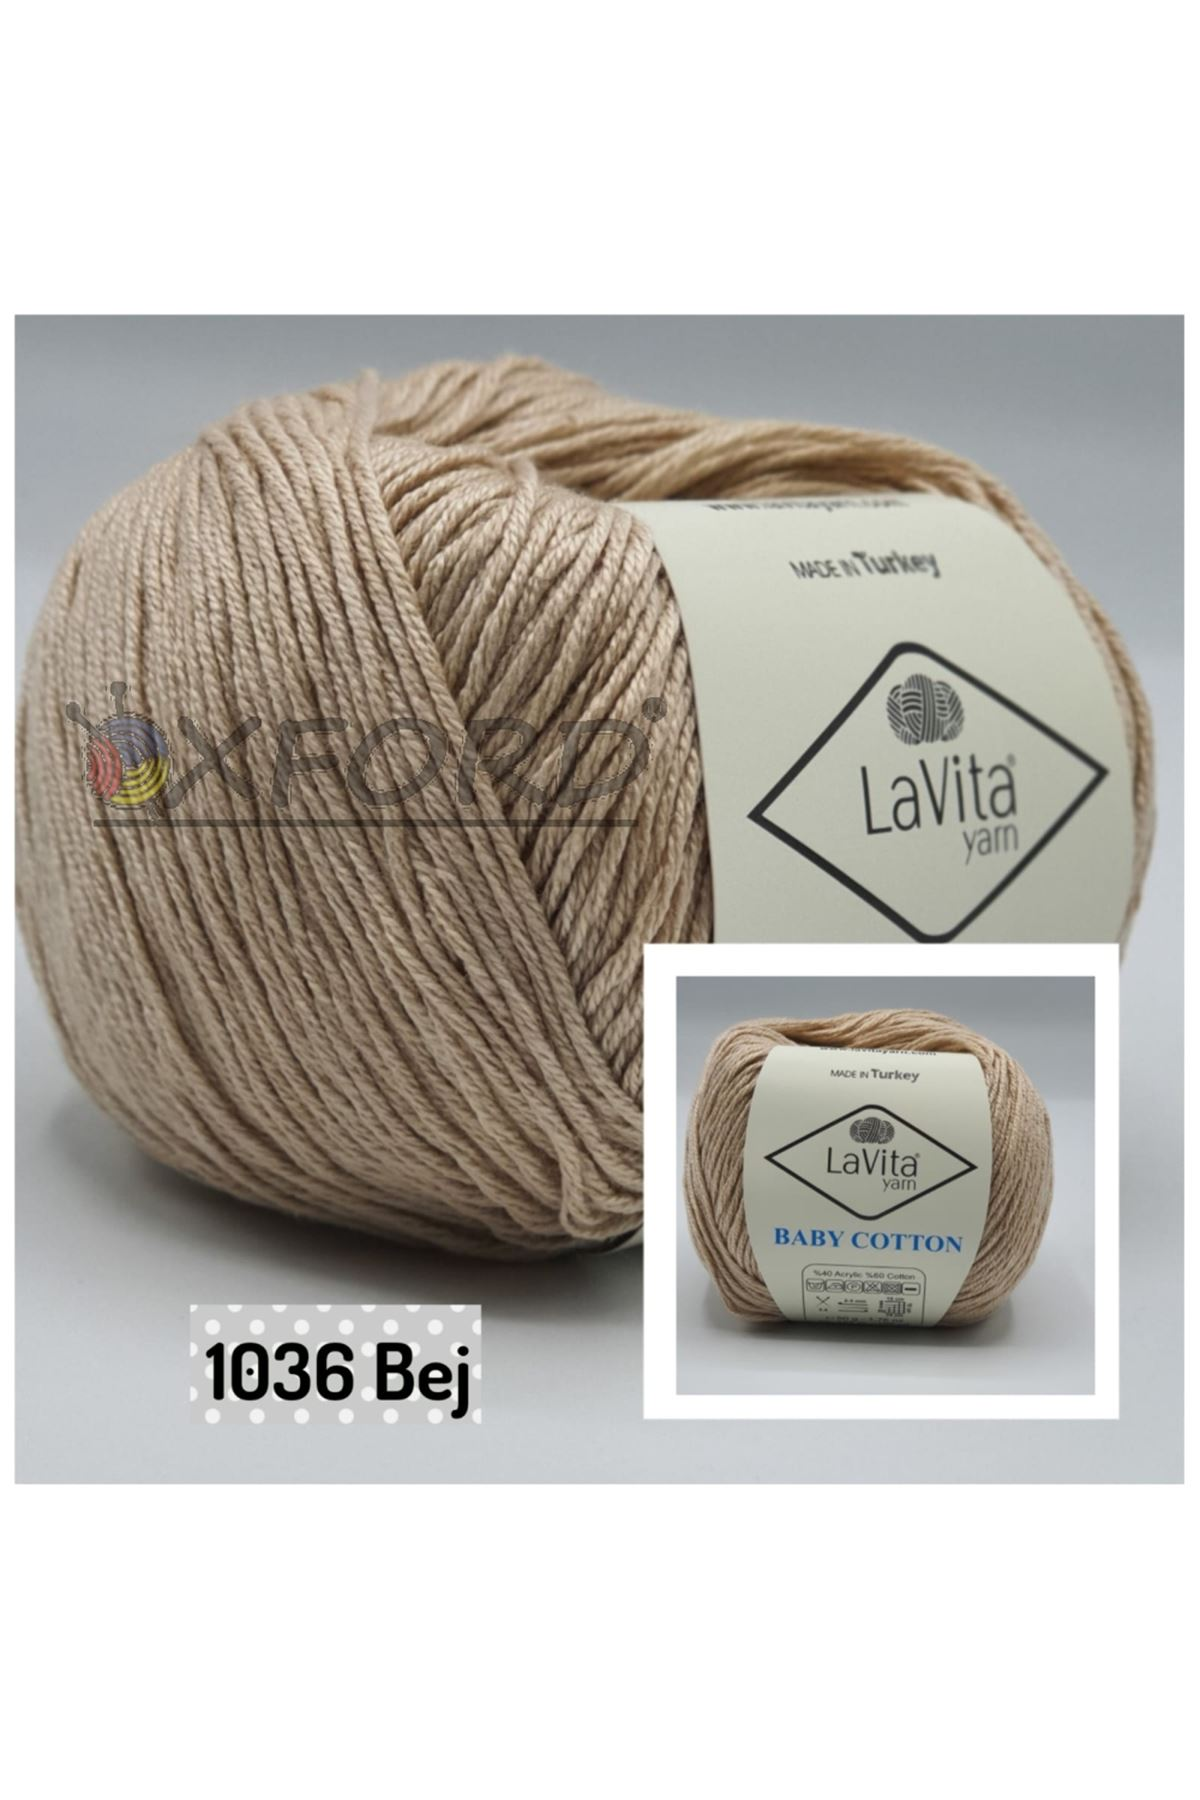 Lavita Baby Cotton 1036 Bej